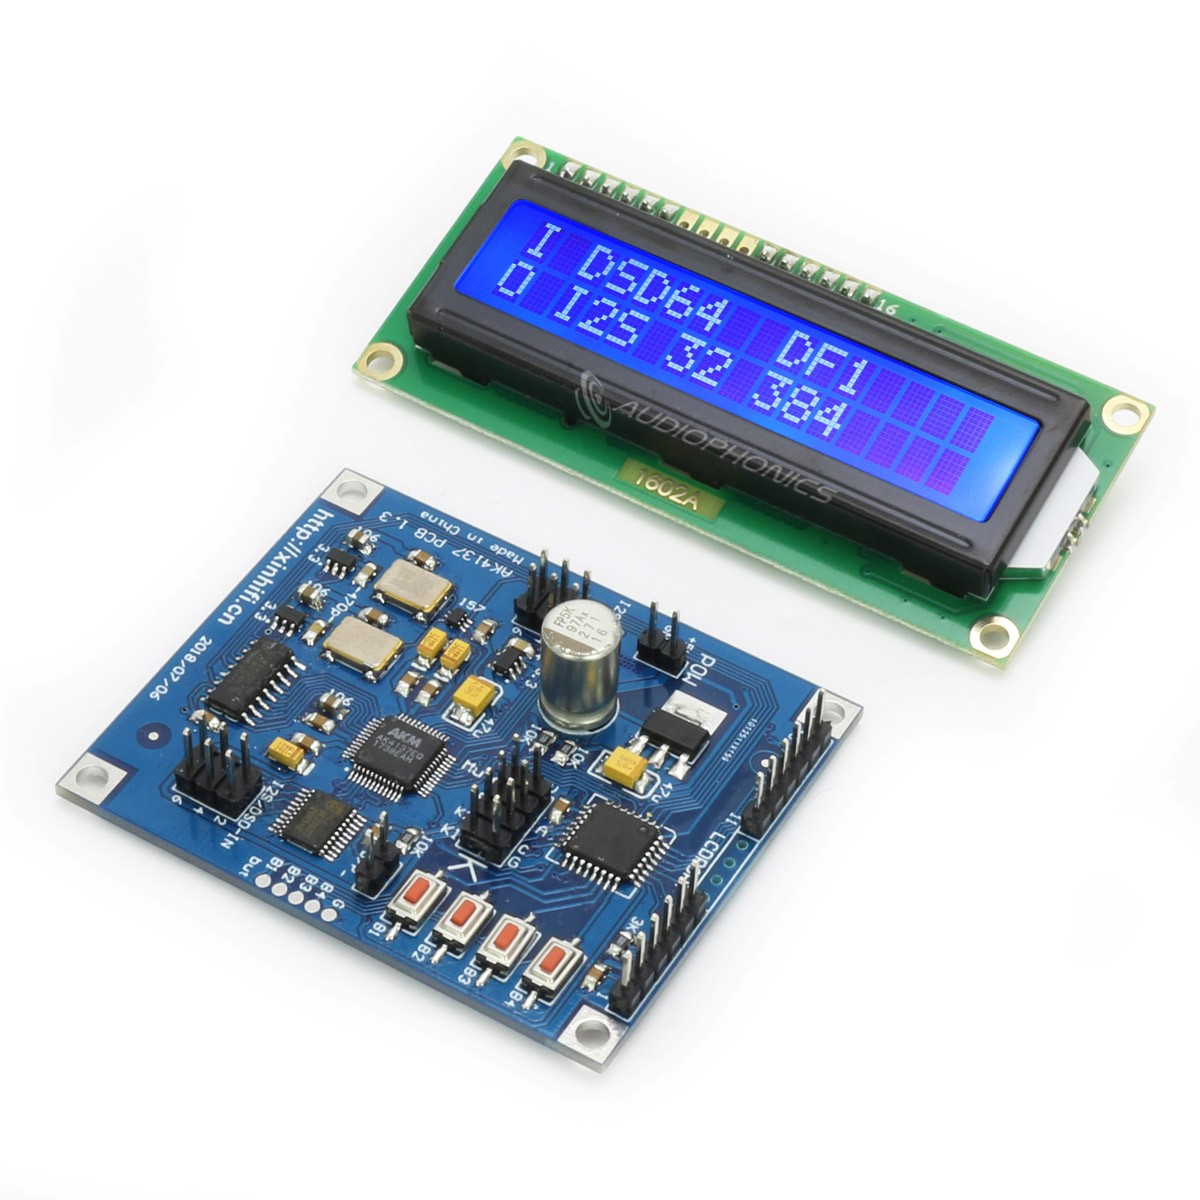 Digital Upsampling Interface SRC AK4137 I2S 32bit 384kHz DSD256 with Screen